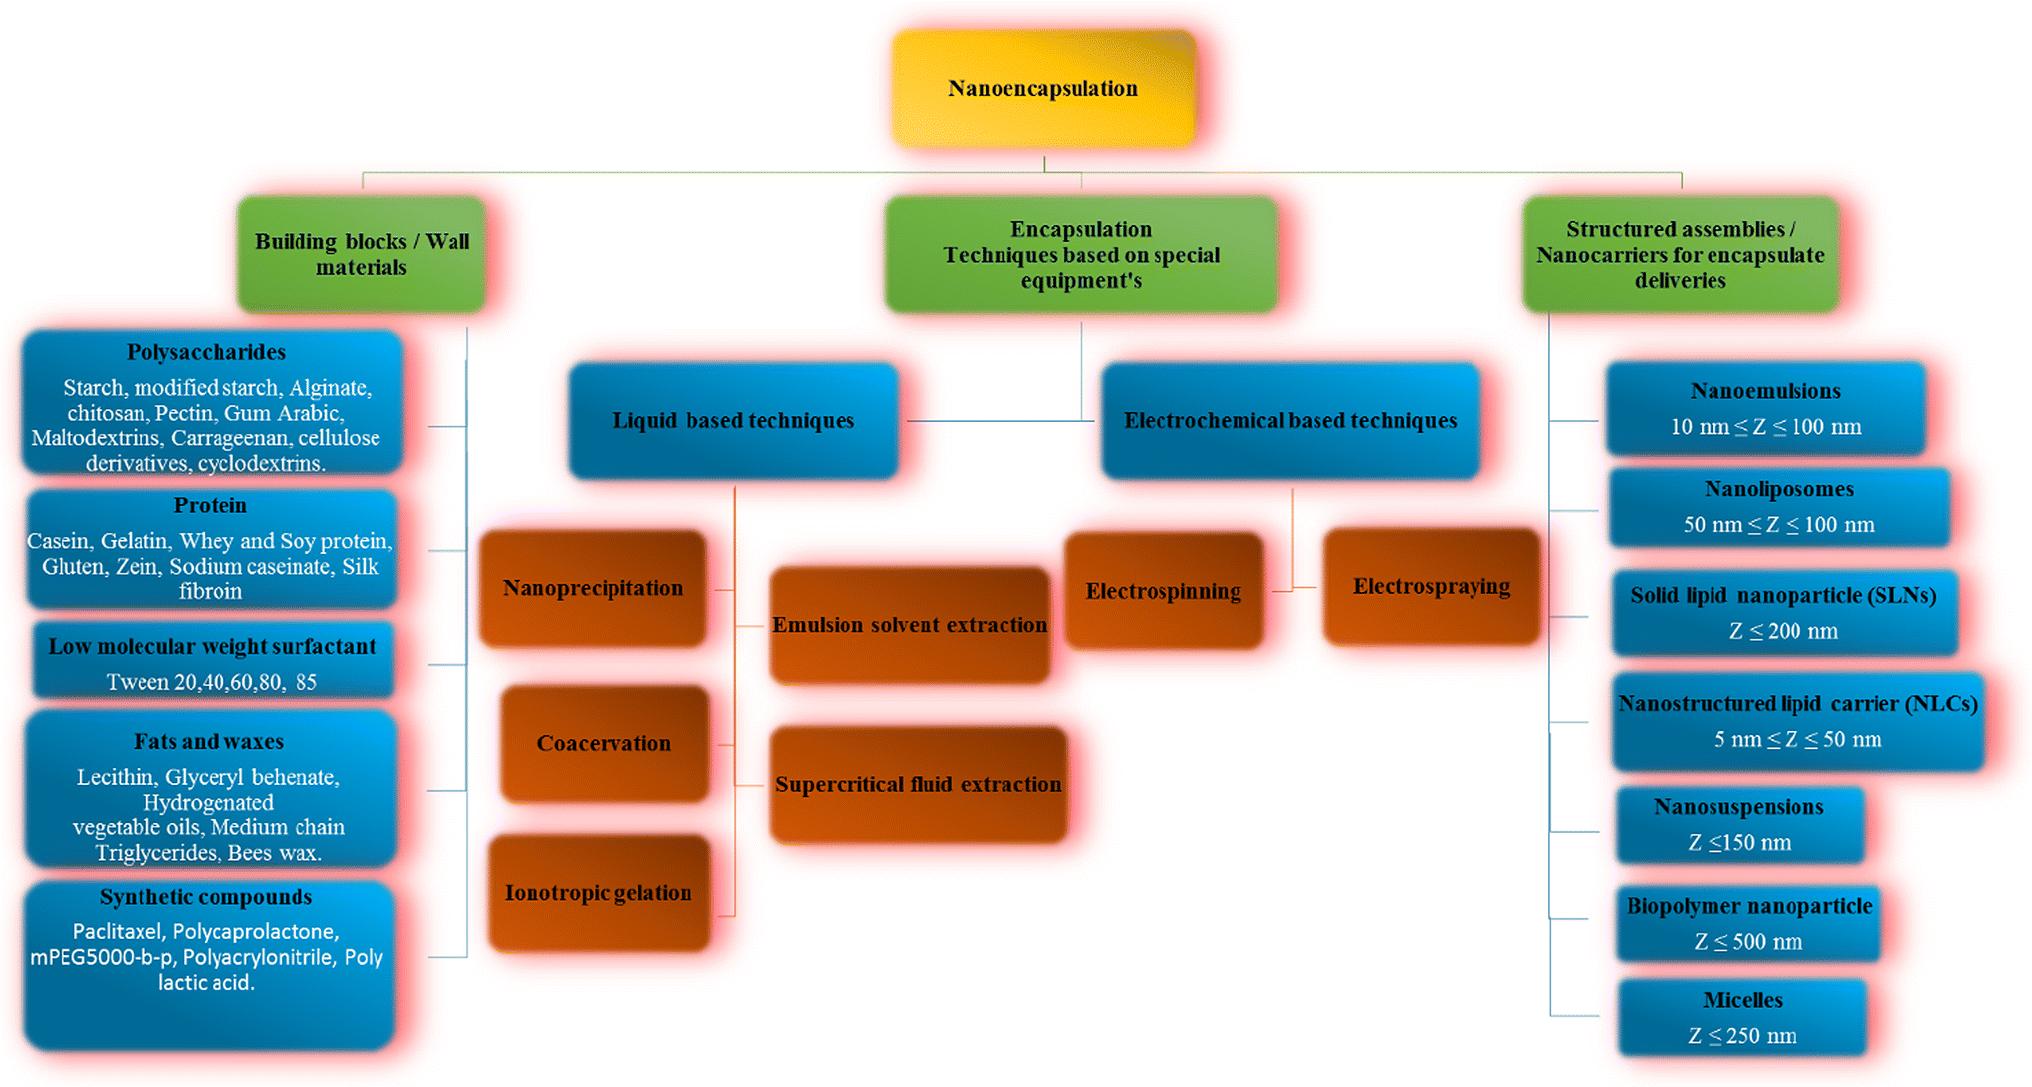 Nanoencapsulation Strategies For Lipid Soluble Vitamins Springerlink Tween 20 Polysorbate 1kg Open Image In New Window